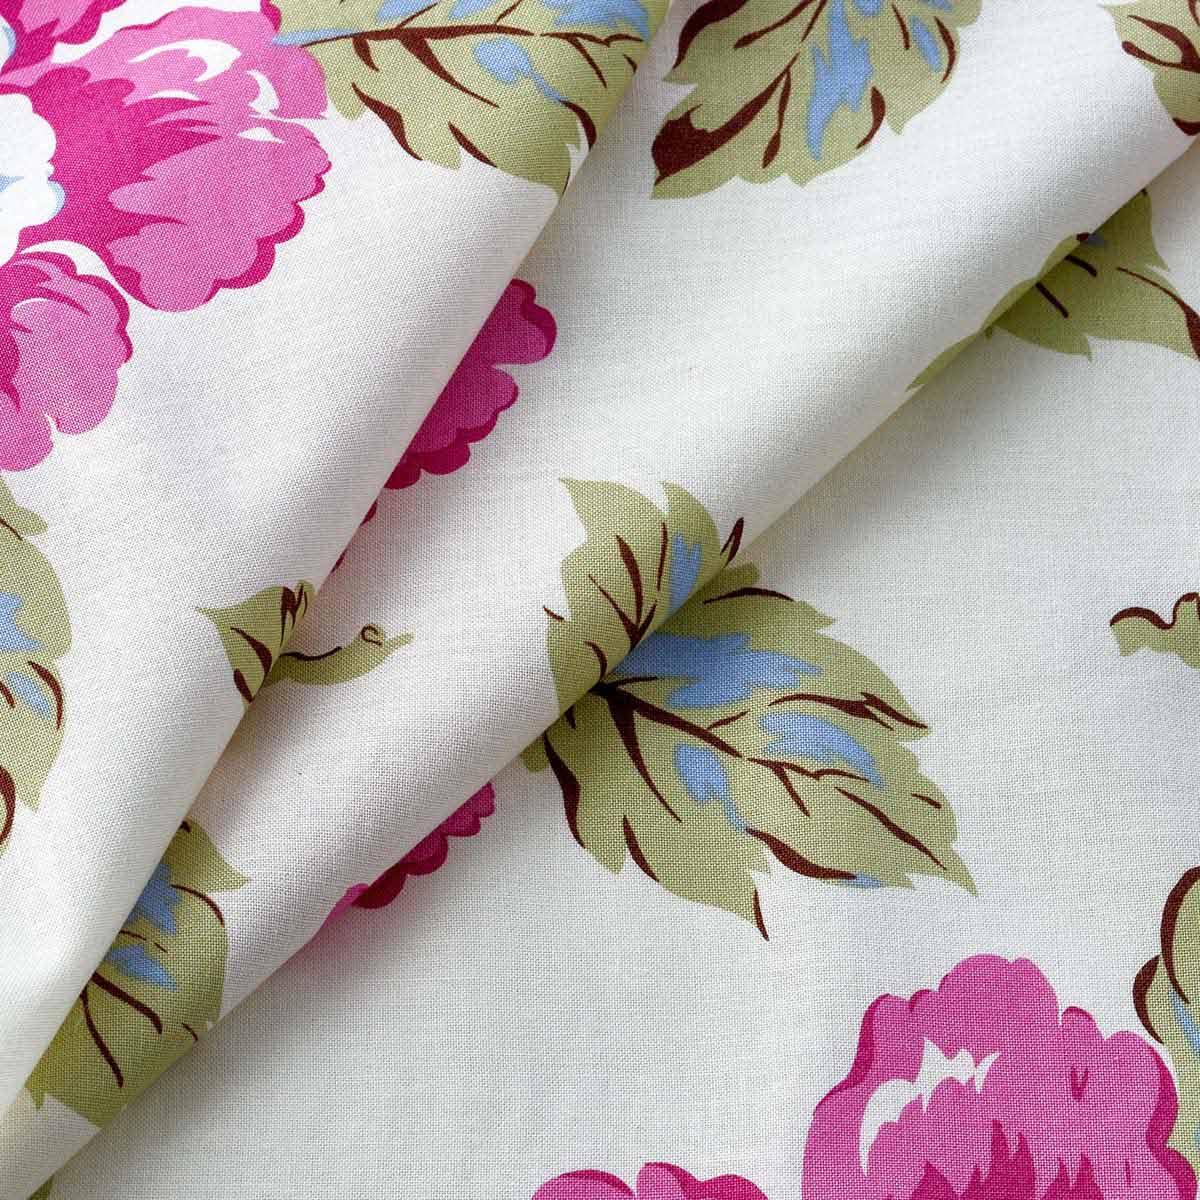 QPWAB088-Linen ROWAN Ткань 100% хл, 50*55см Астра